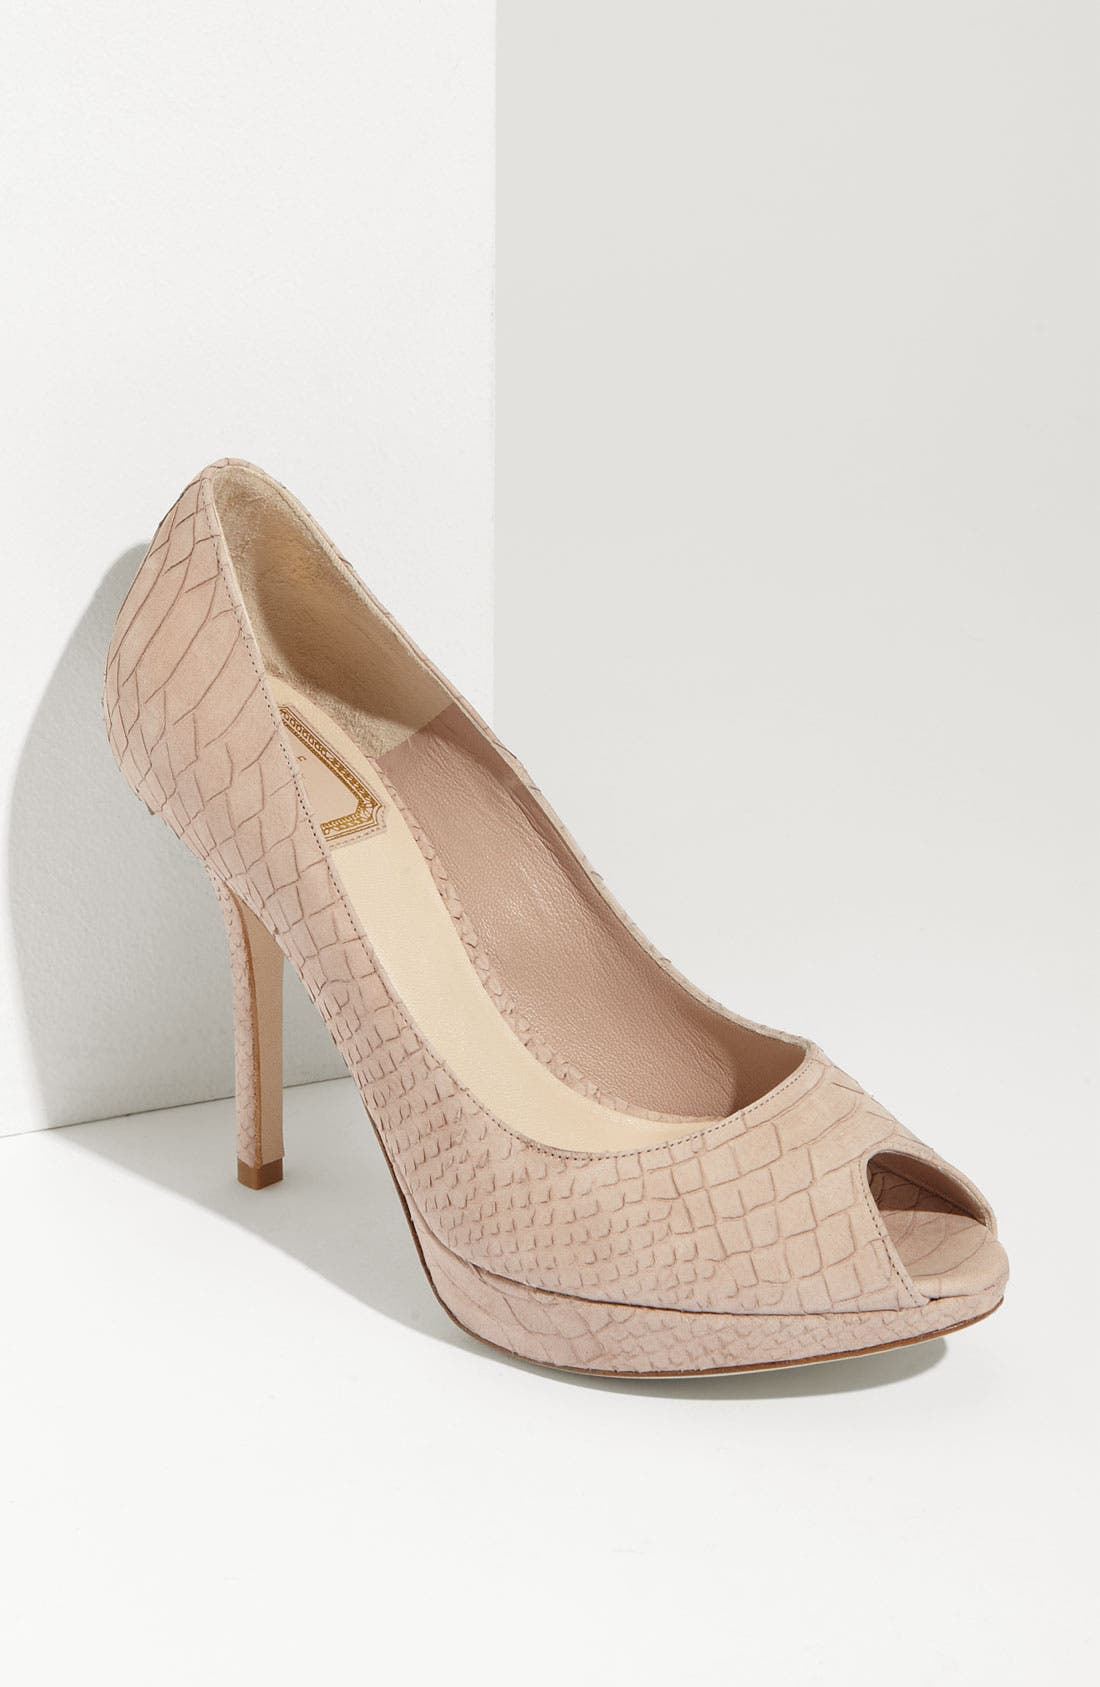 Main Image - Dior 'Miss Dior' Peep Toe Pump